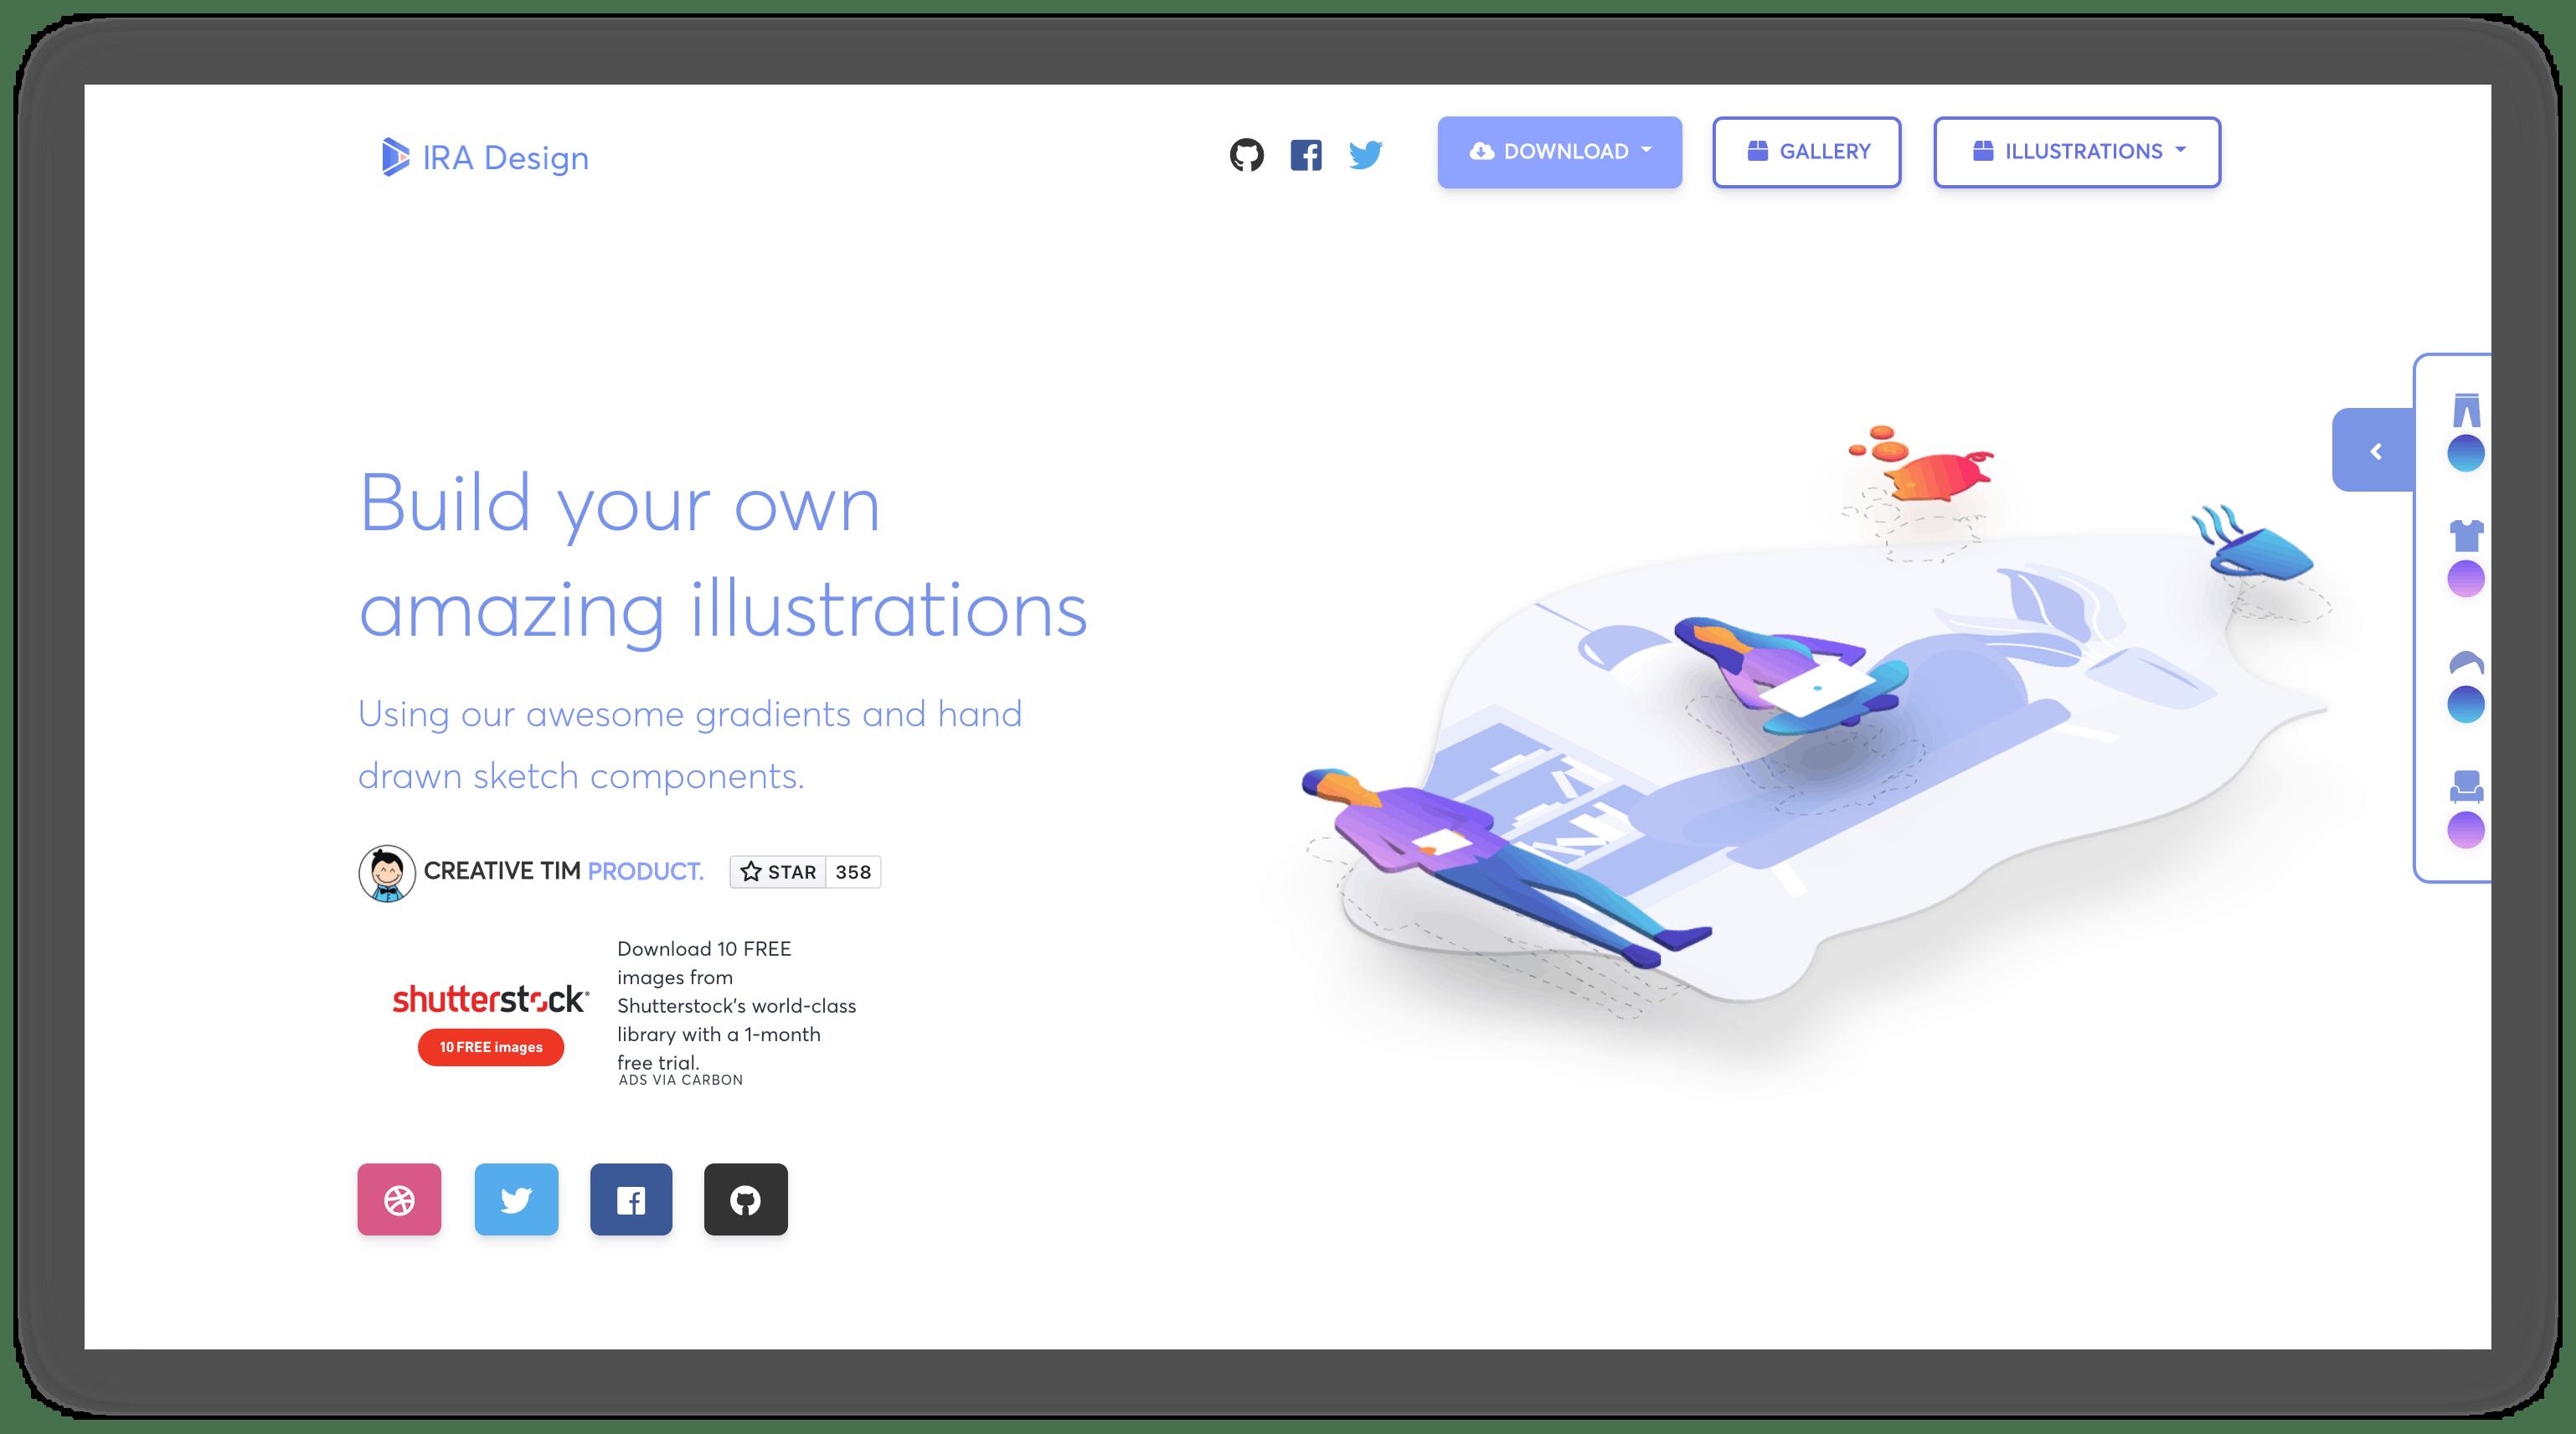 ira designwebsite